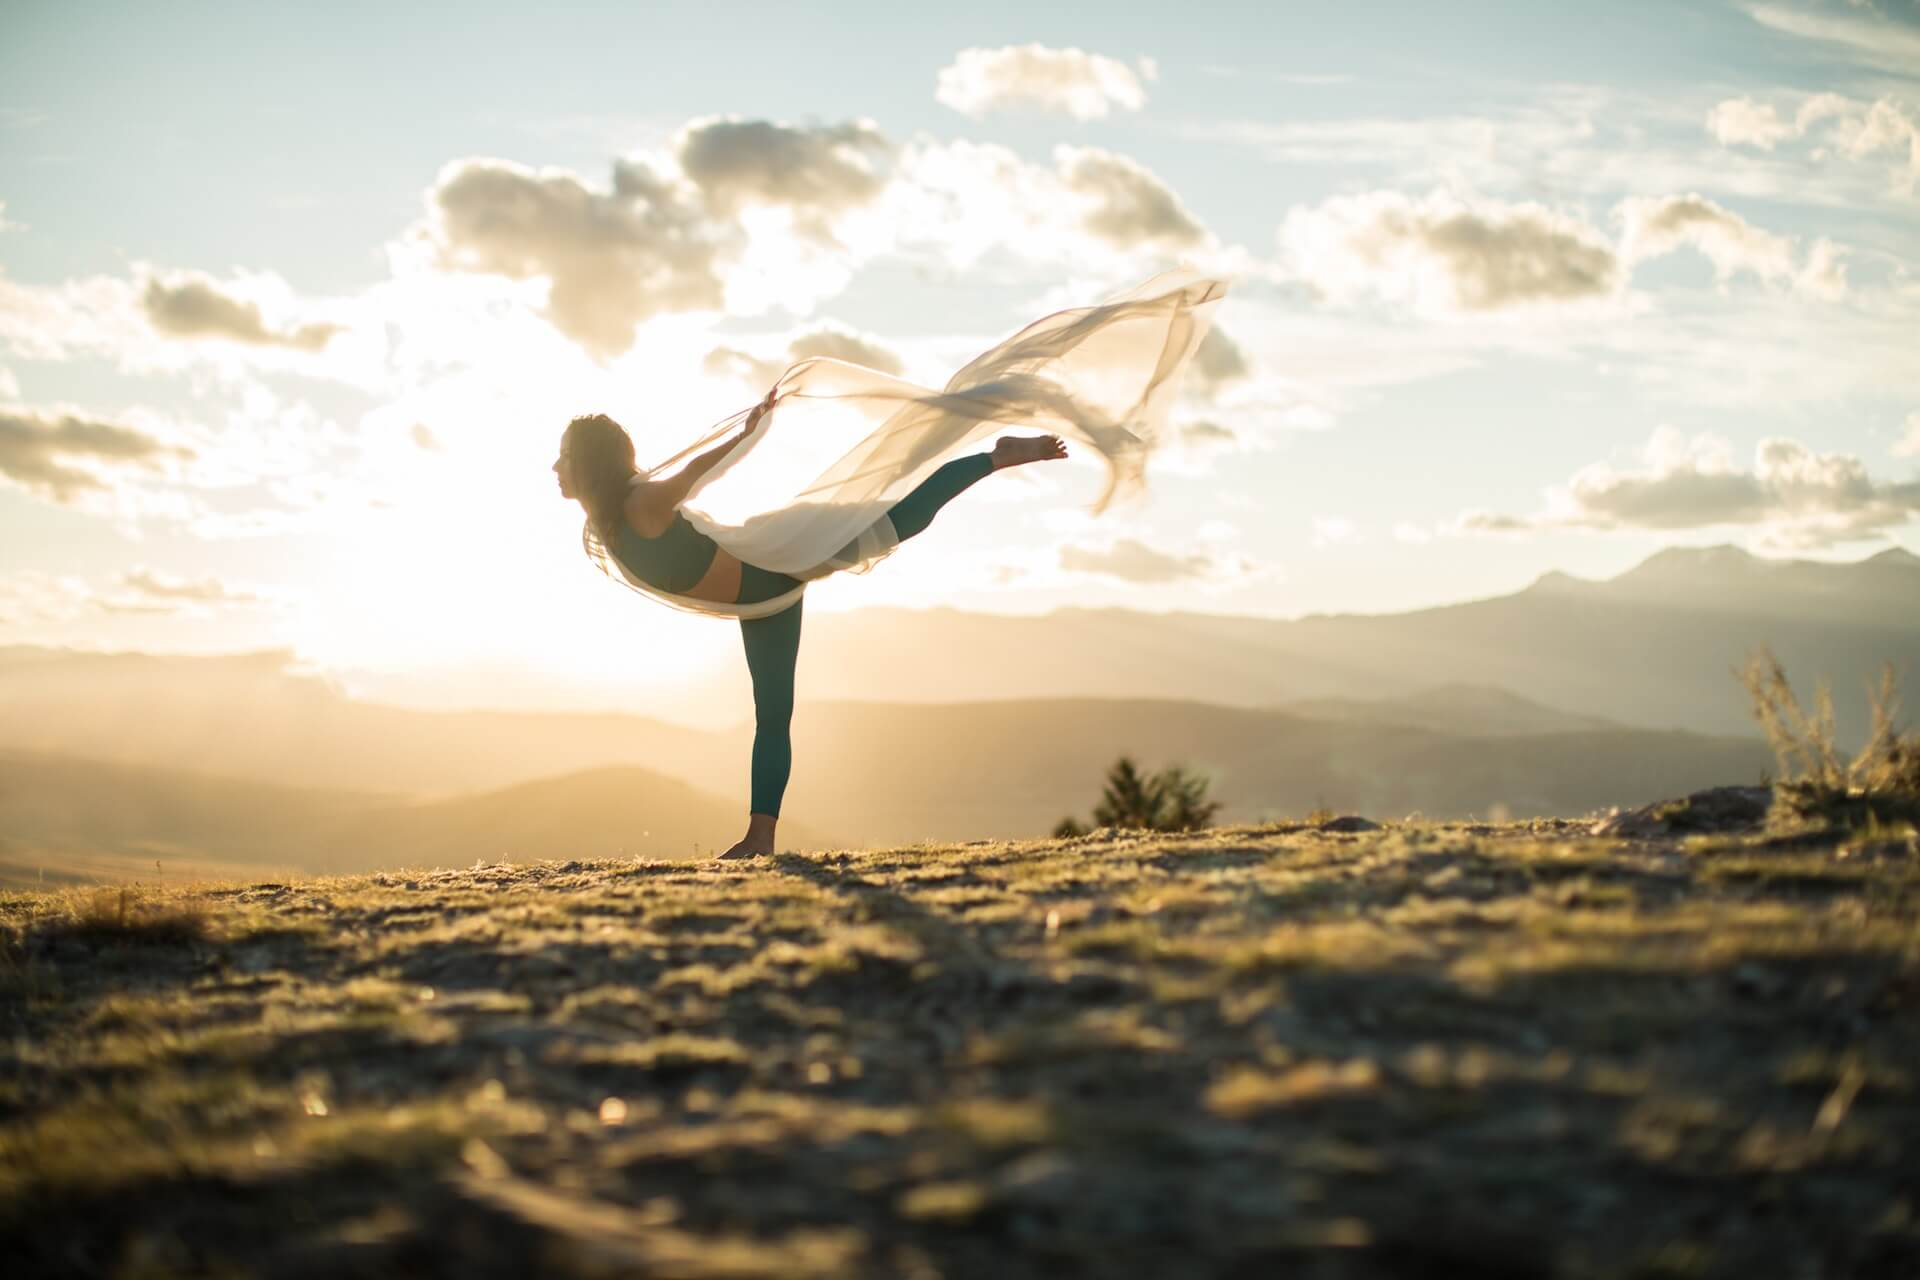 LUXURY CARDが大自然の映像を背景に自宅でヨガを楽しめる「YogaToday」を会員向けに3ヶ月間無料開放 lf200402_yogatoday_02